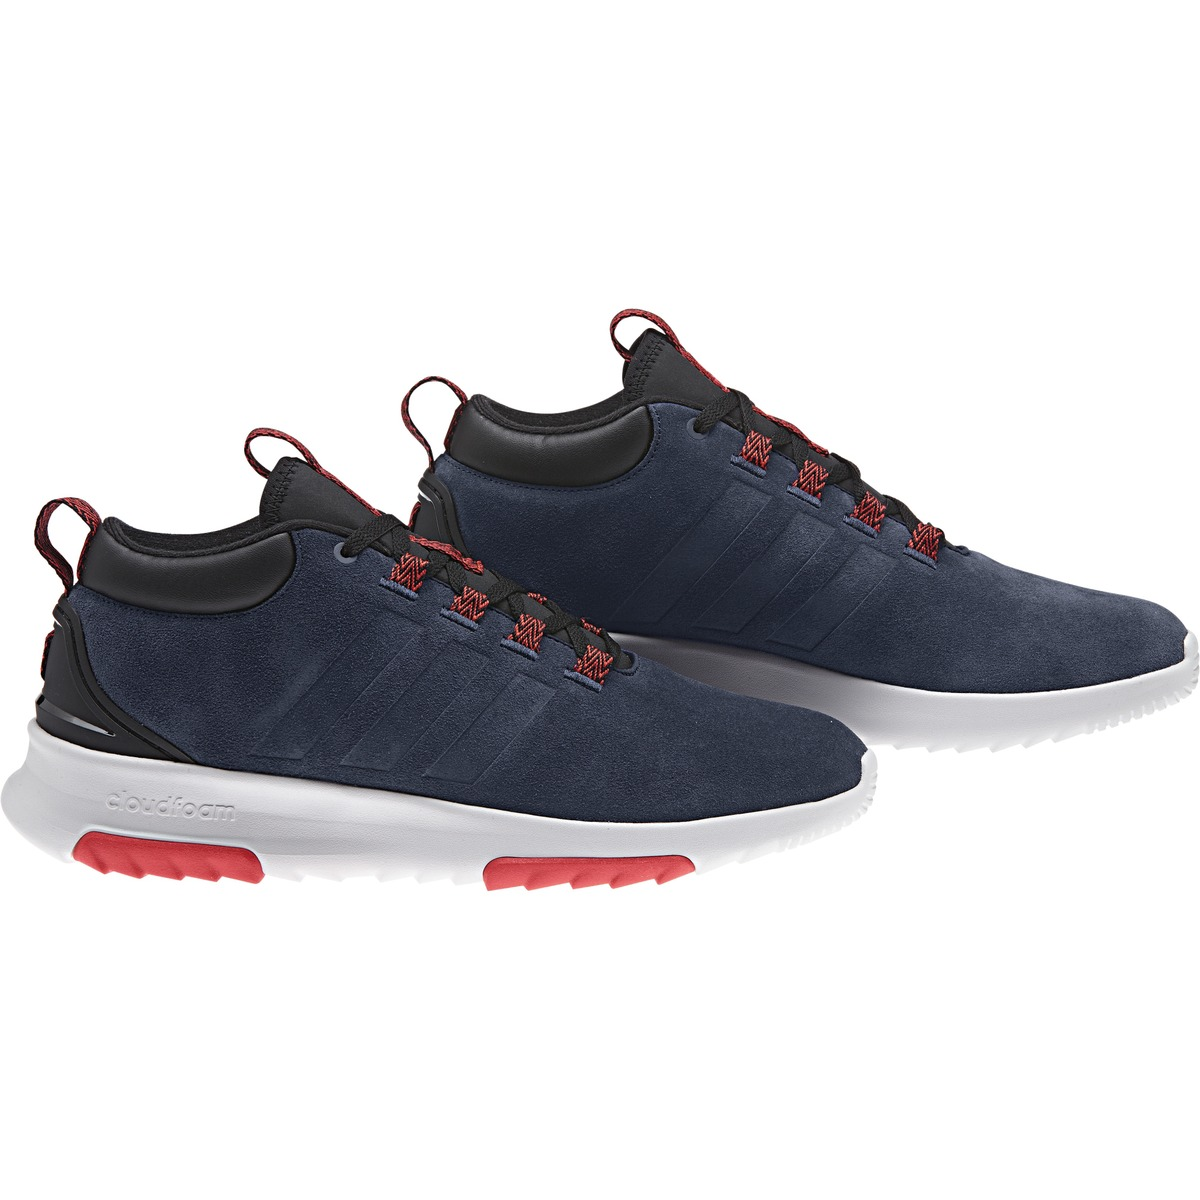 xxl adidas skor